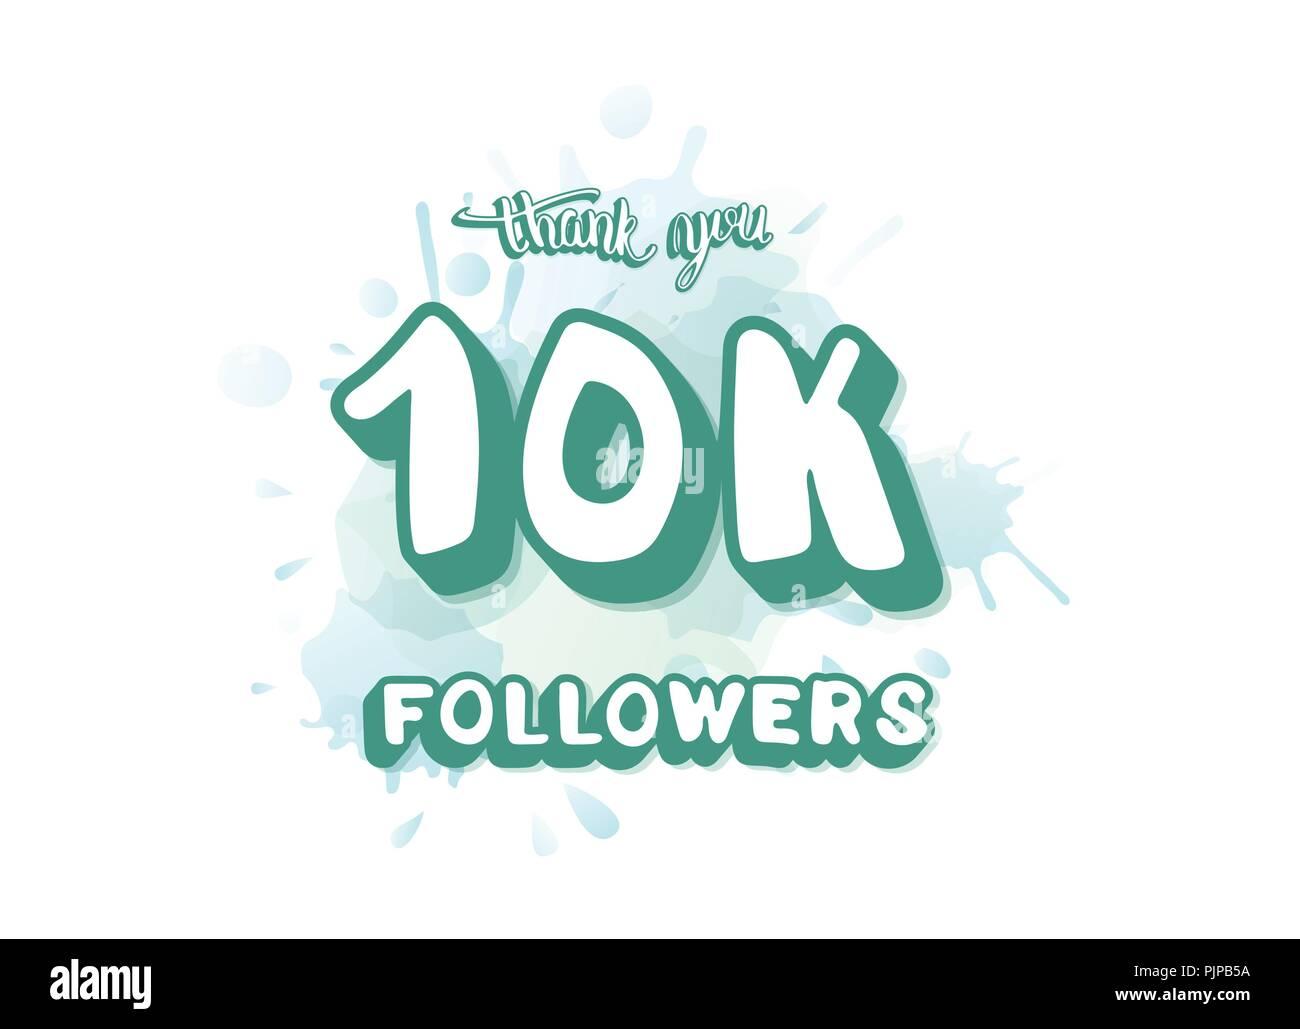 10k followers thank you social media template banner for internet